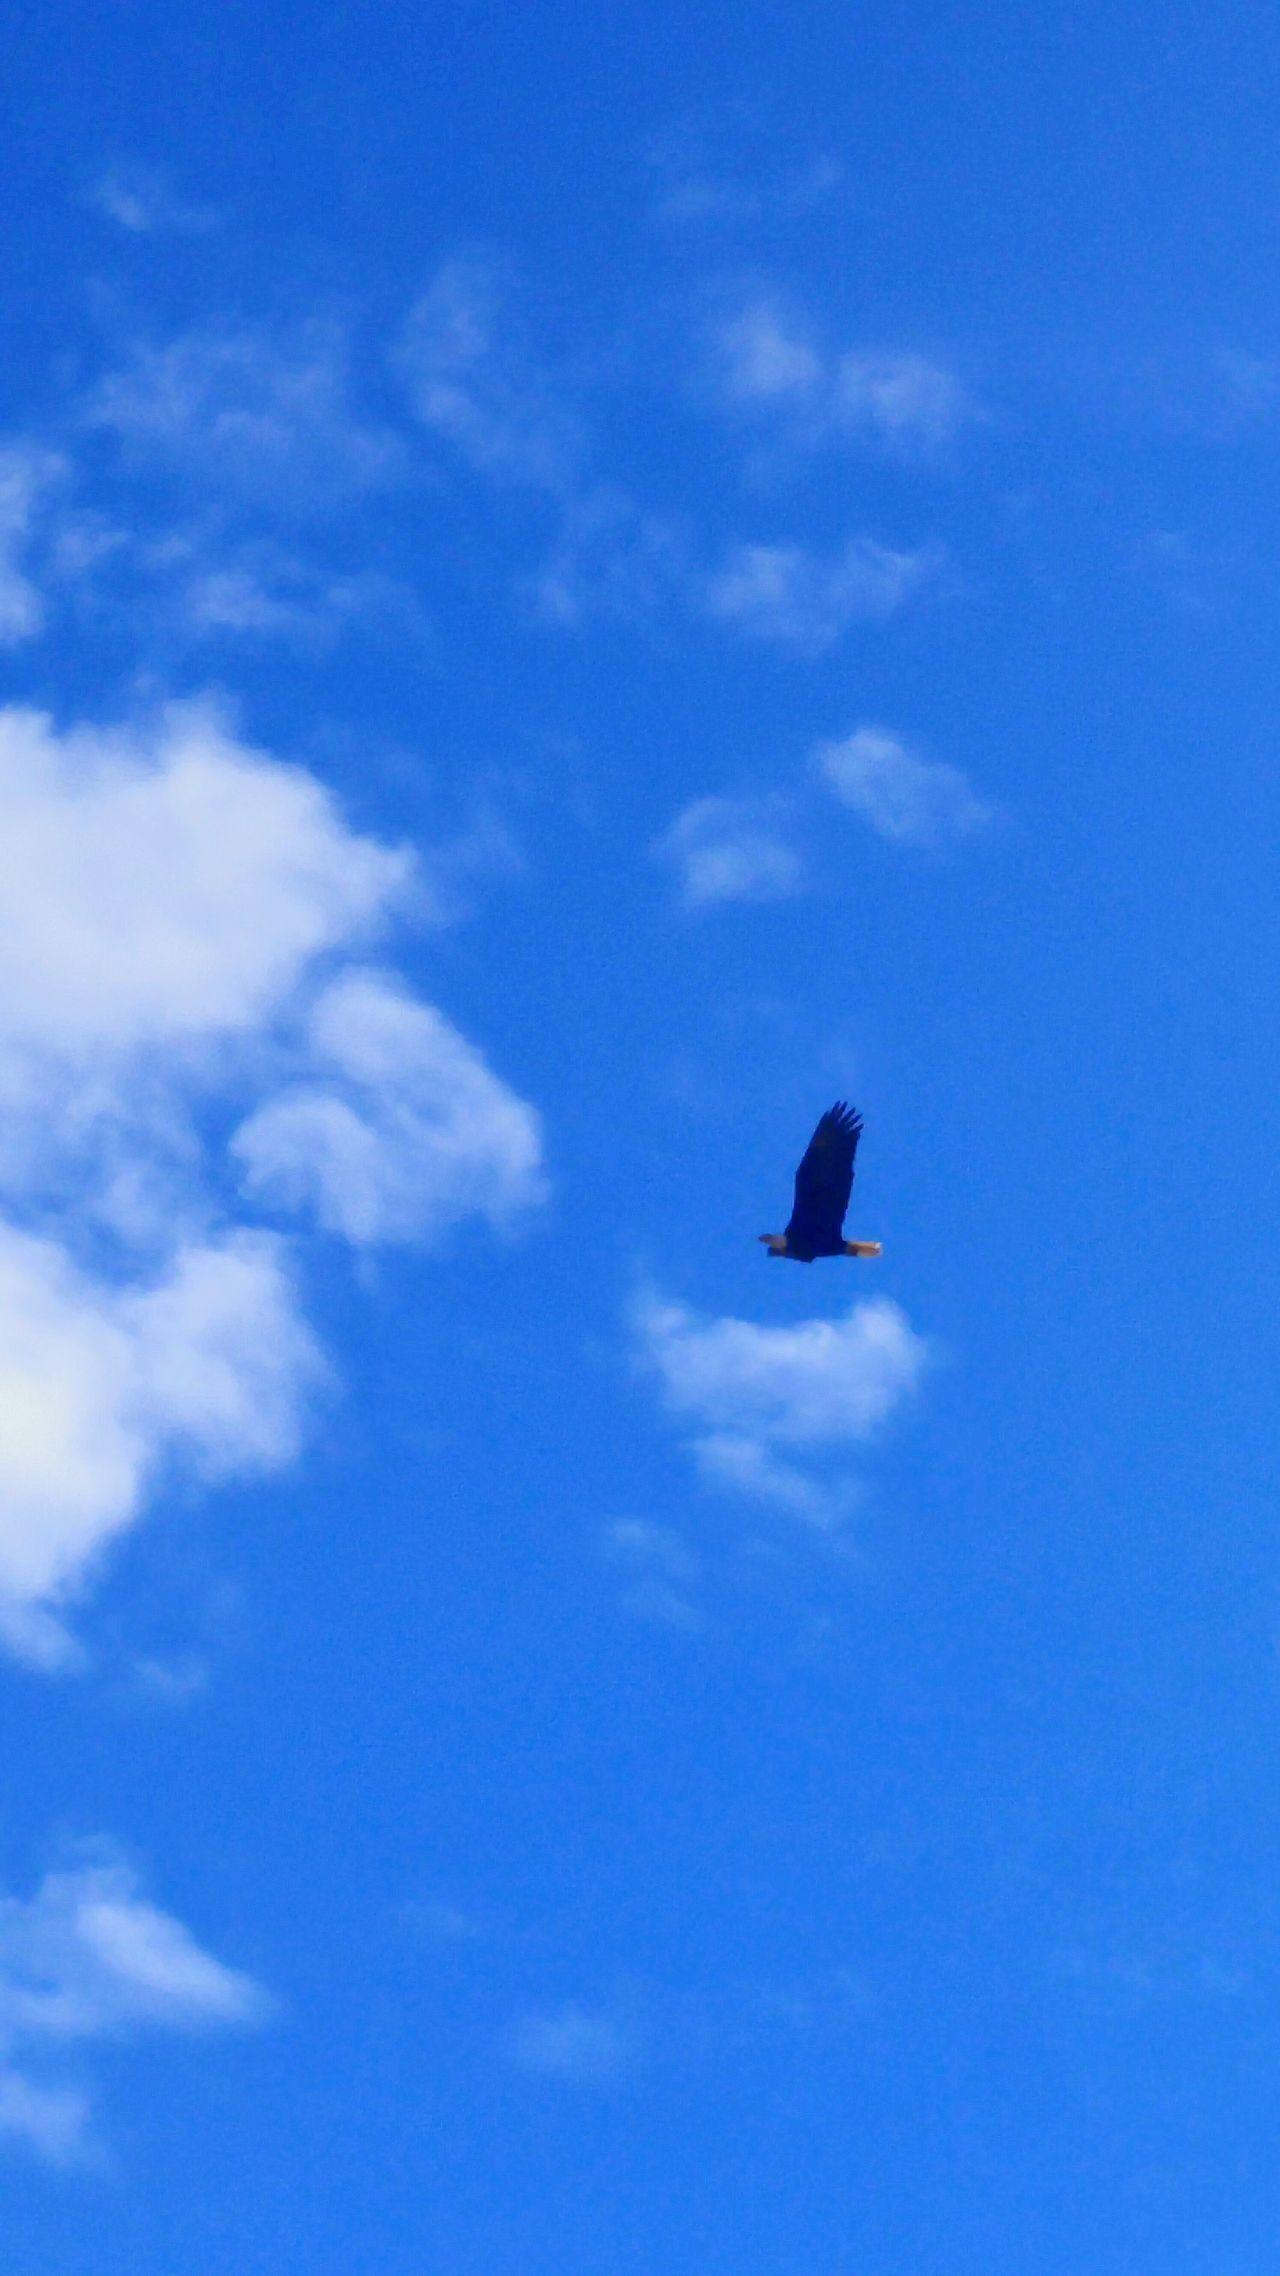 In flight Bald Eagle Bald Eagle In Flight Blue Flying Sky Cloud - Sky No People Nature Central Oregon Bald Eagles EaglesNATION Beauty In Nature